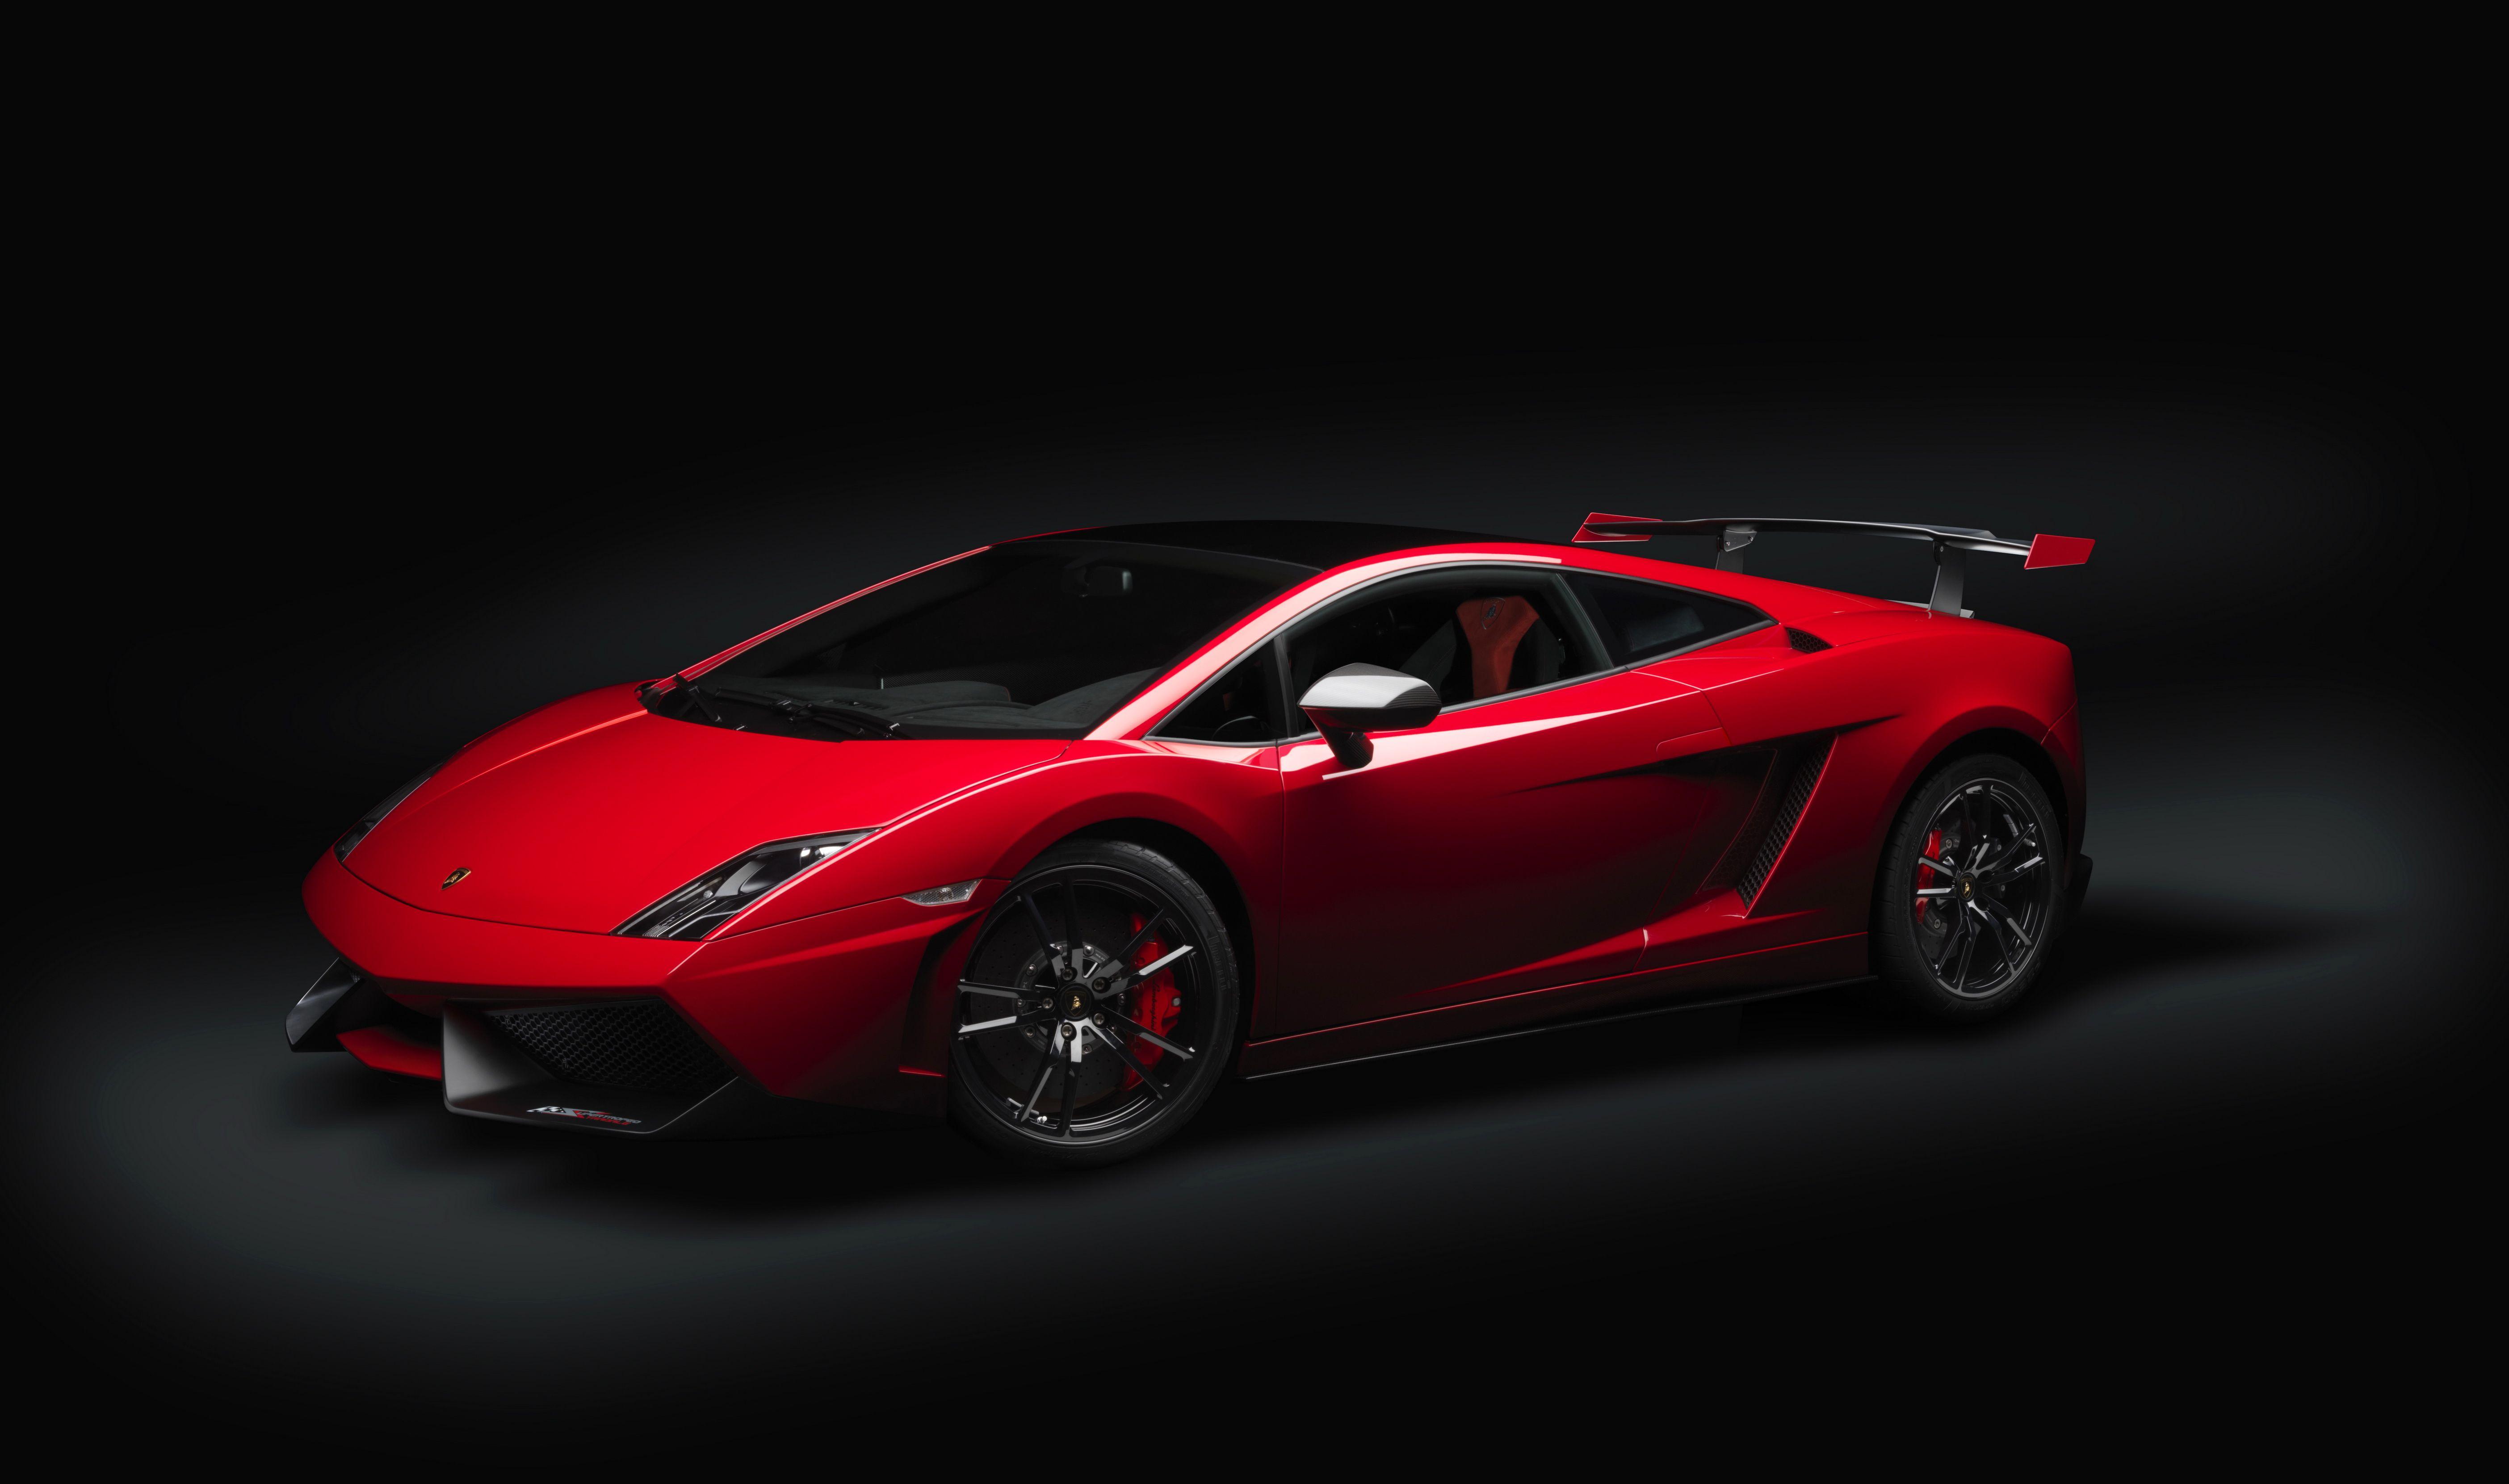 Red Lamborghini Gallardo Lp 550 2 Sport Car Wallpaper Black